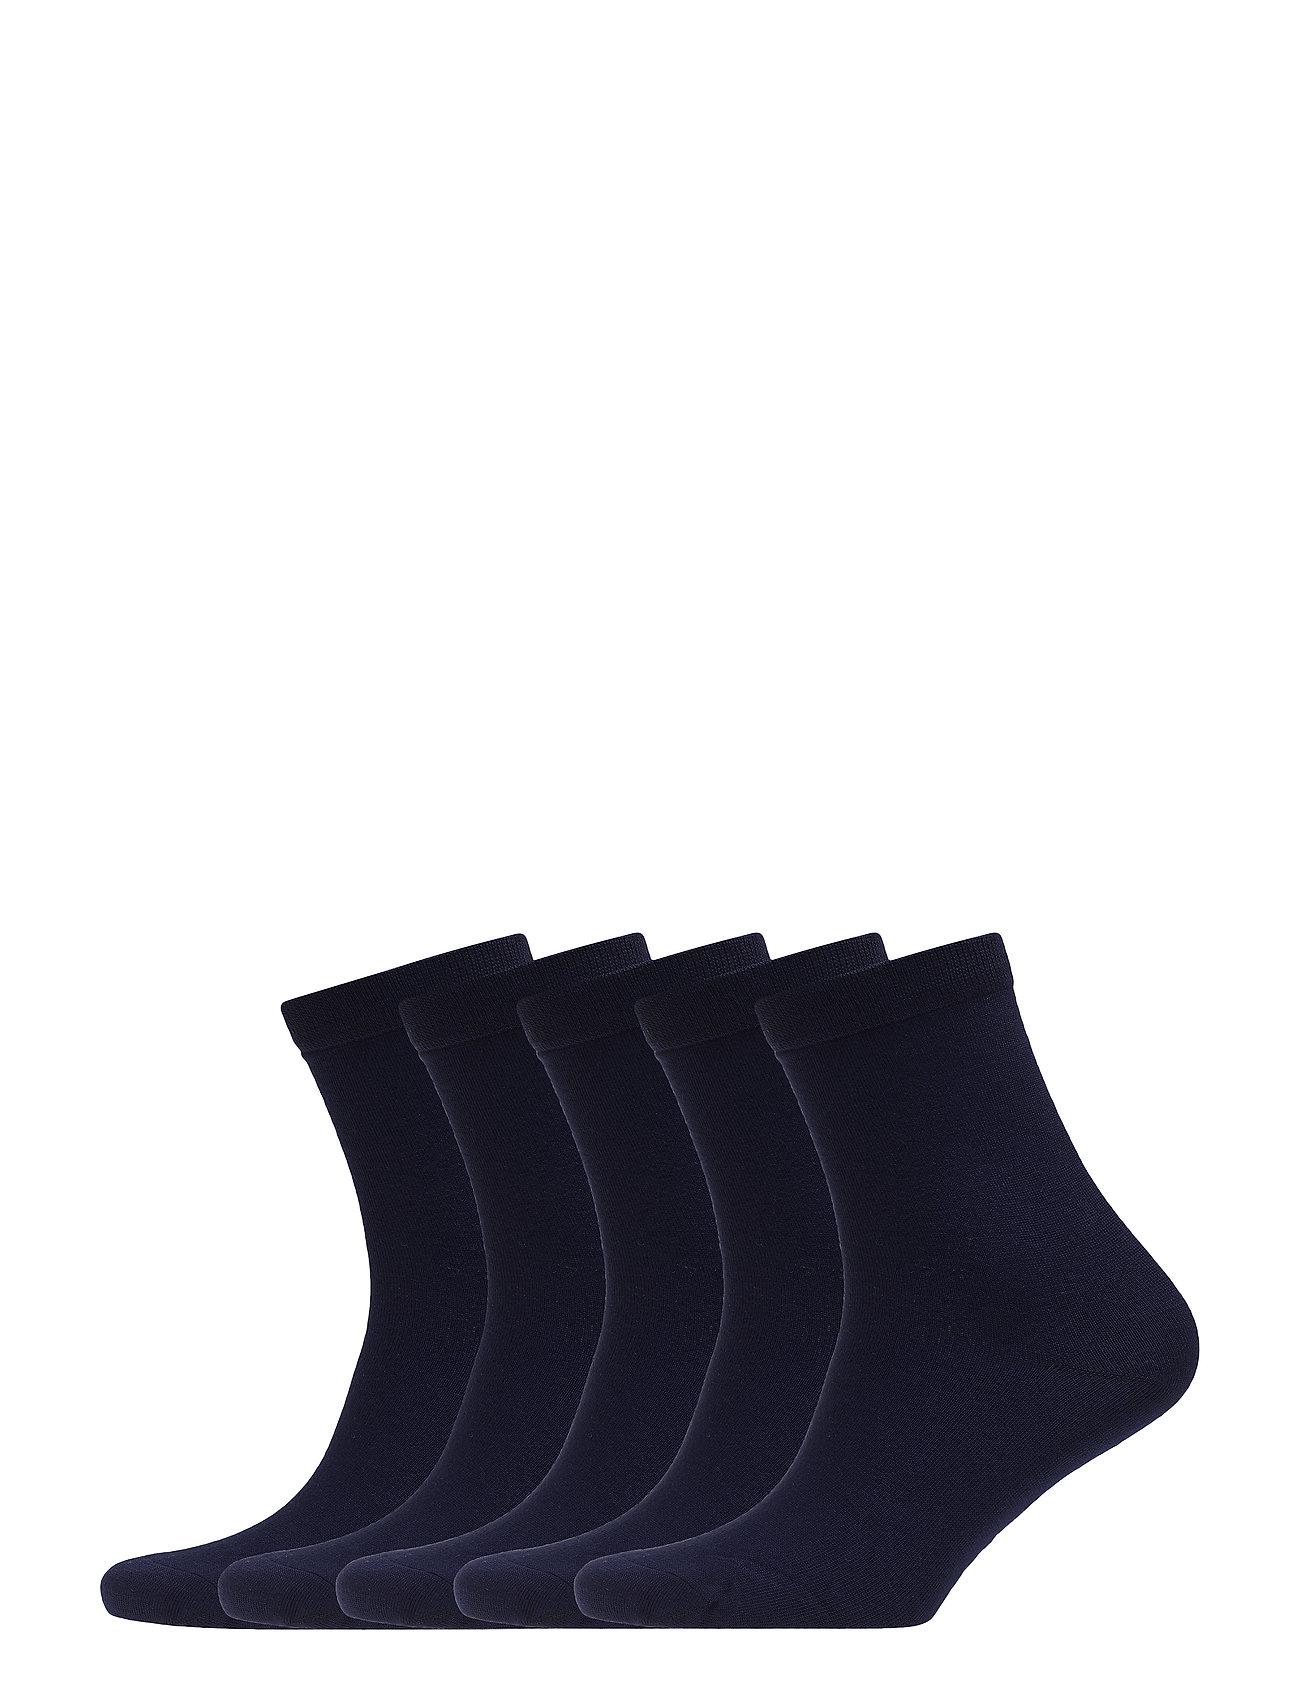 Frank Dandy 5P Bamboo Solid Crew Sock - DARK NAVY